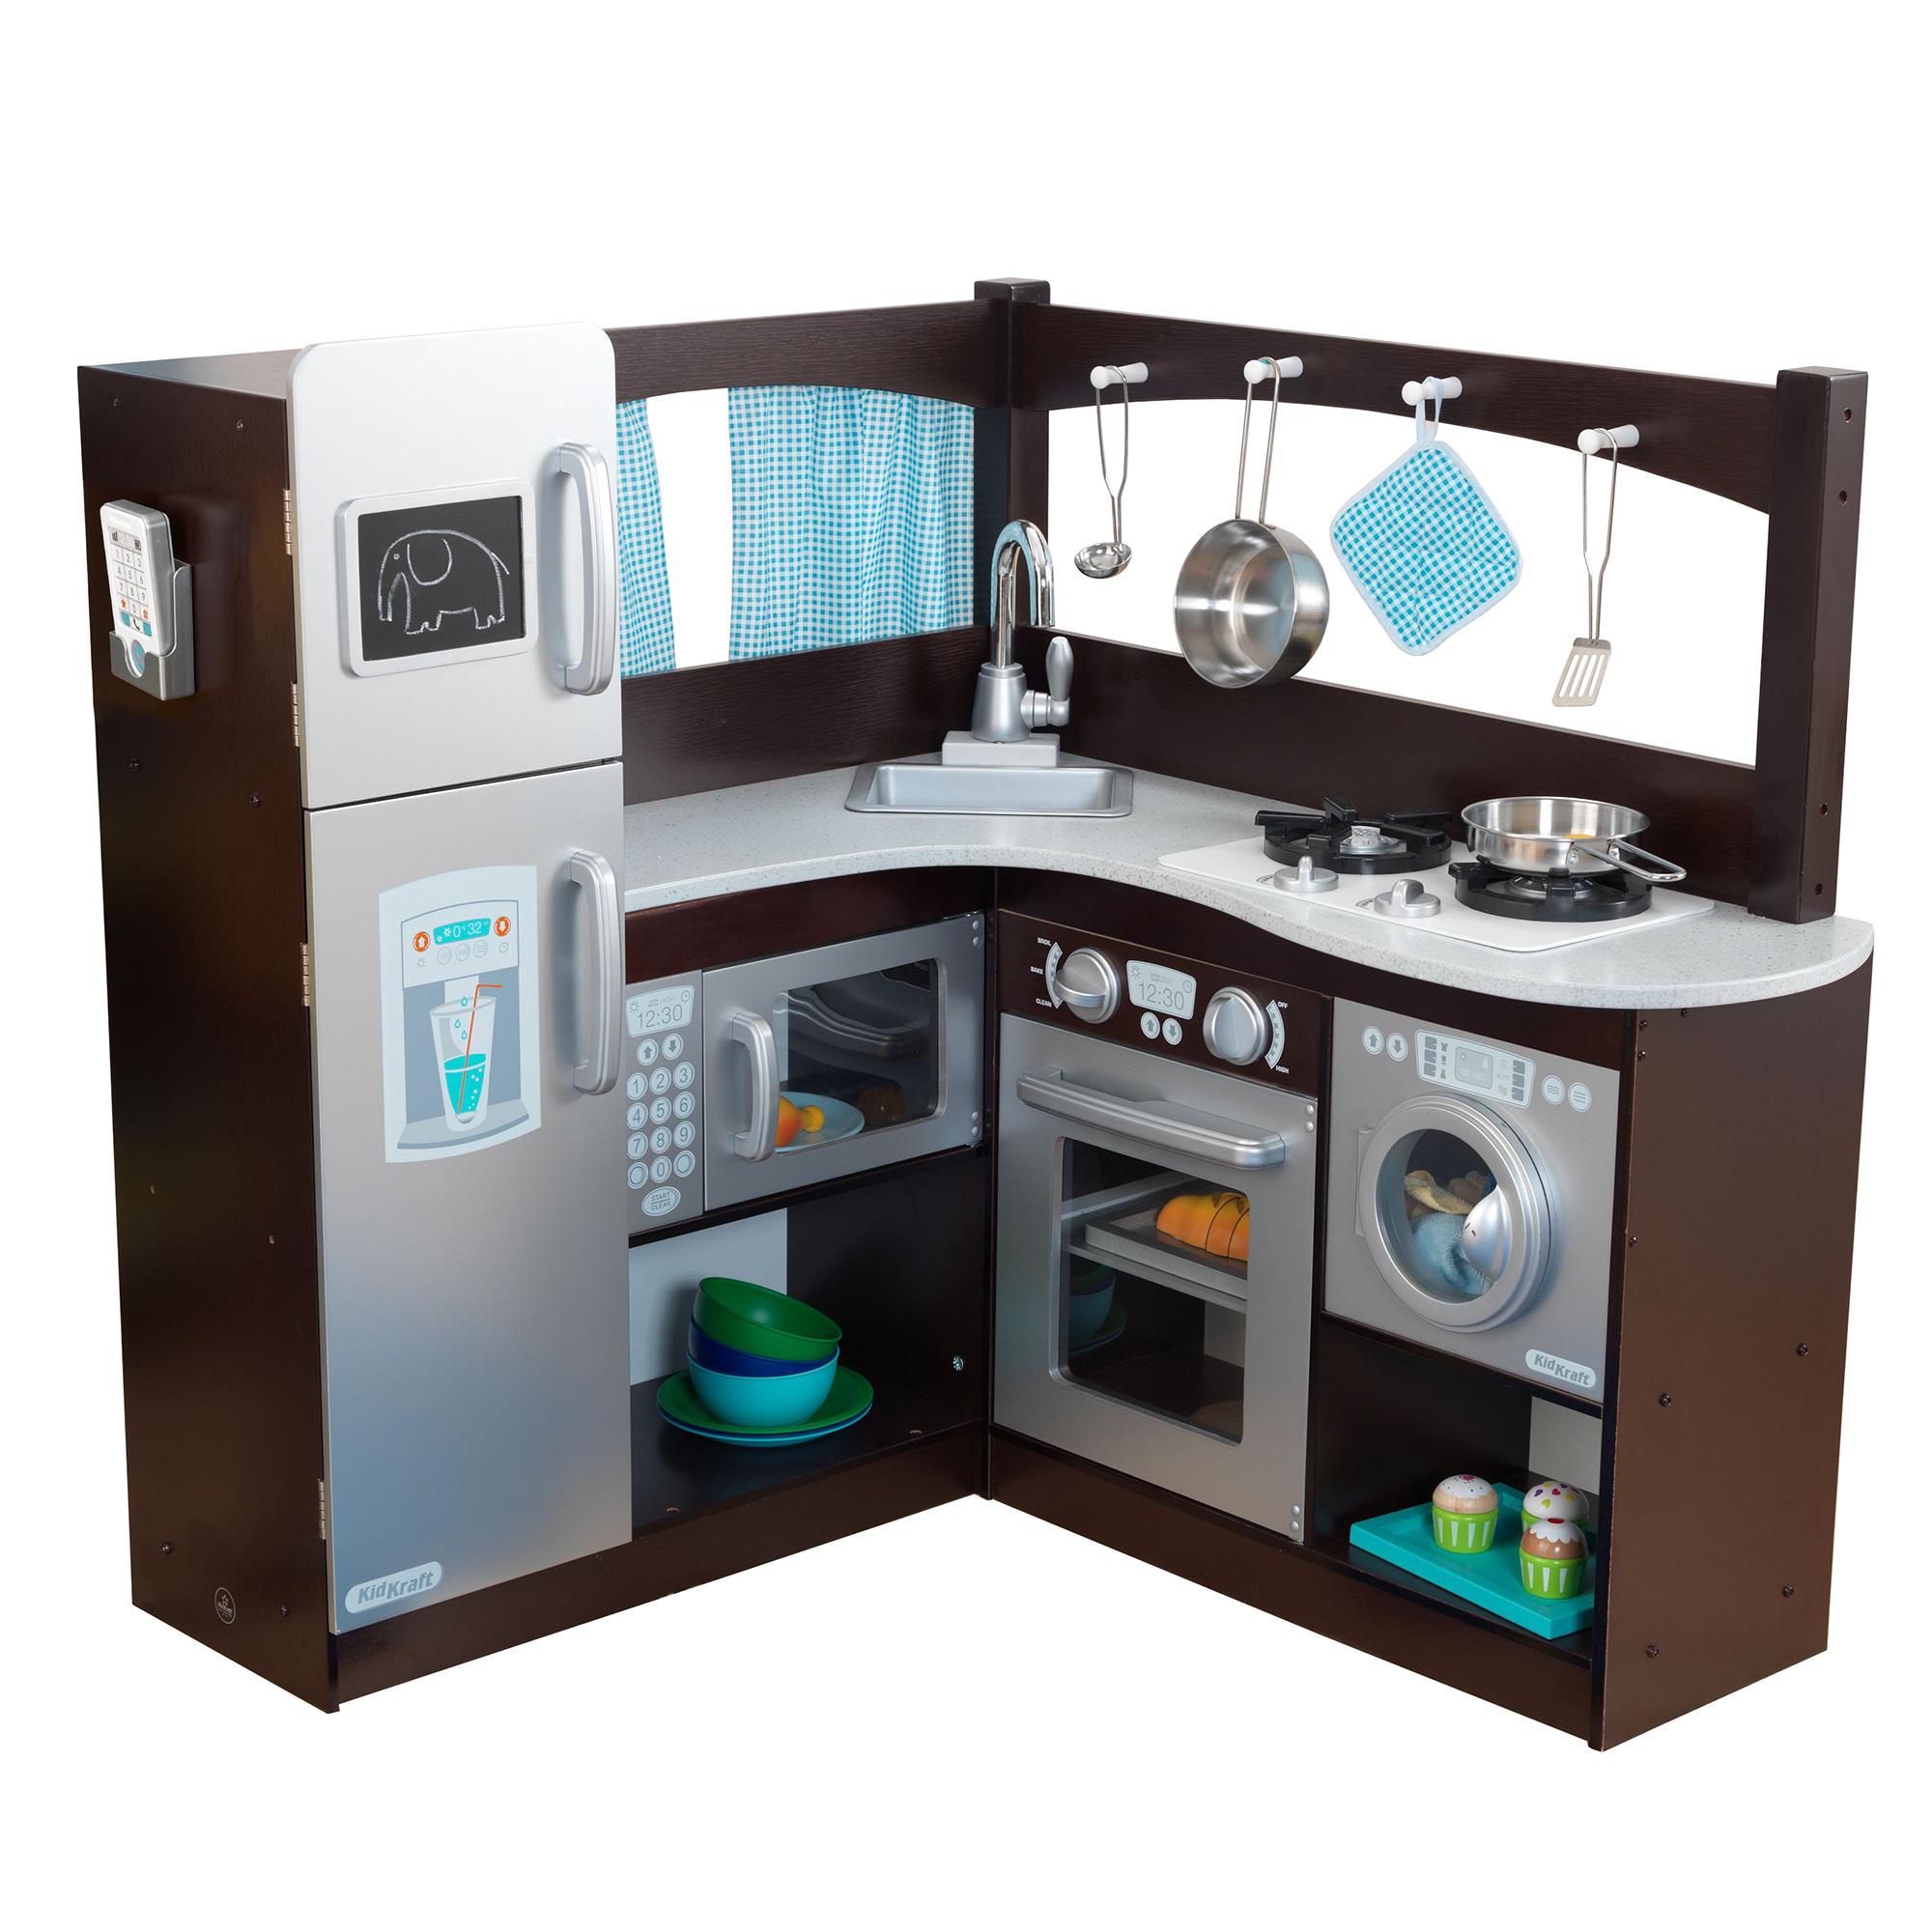 Details about KidKraft Grand Gourmet Uptown Espresso Corner Wood Play  Kitchen & Metal Cookware